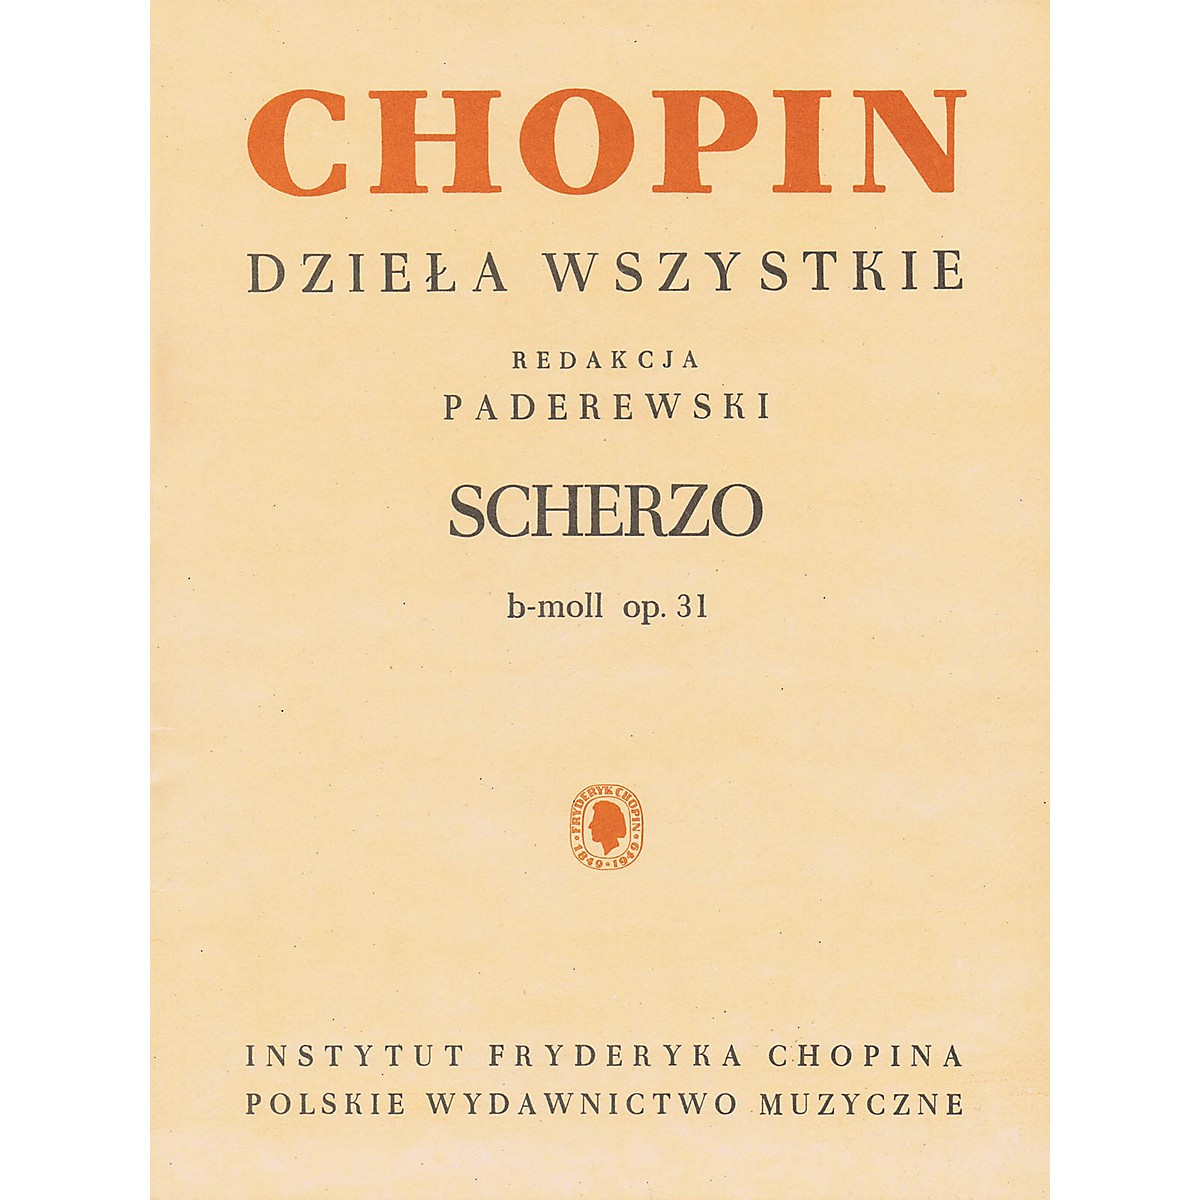 PWM Scherzo in B Flat Minor for Piano PWM Softcover by Frederic Chopin Edited by Ignacy Jan Paderewski